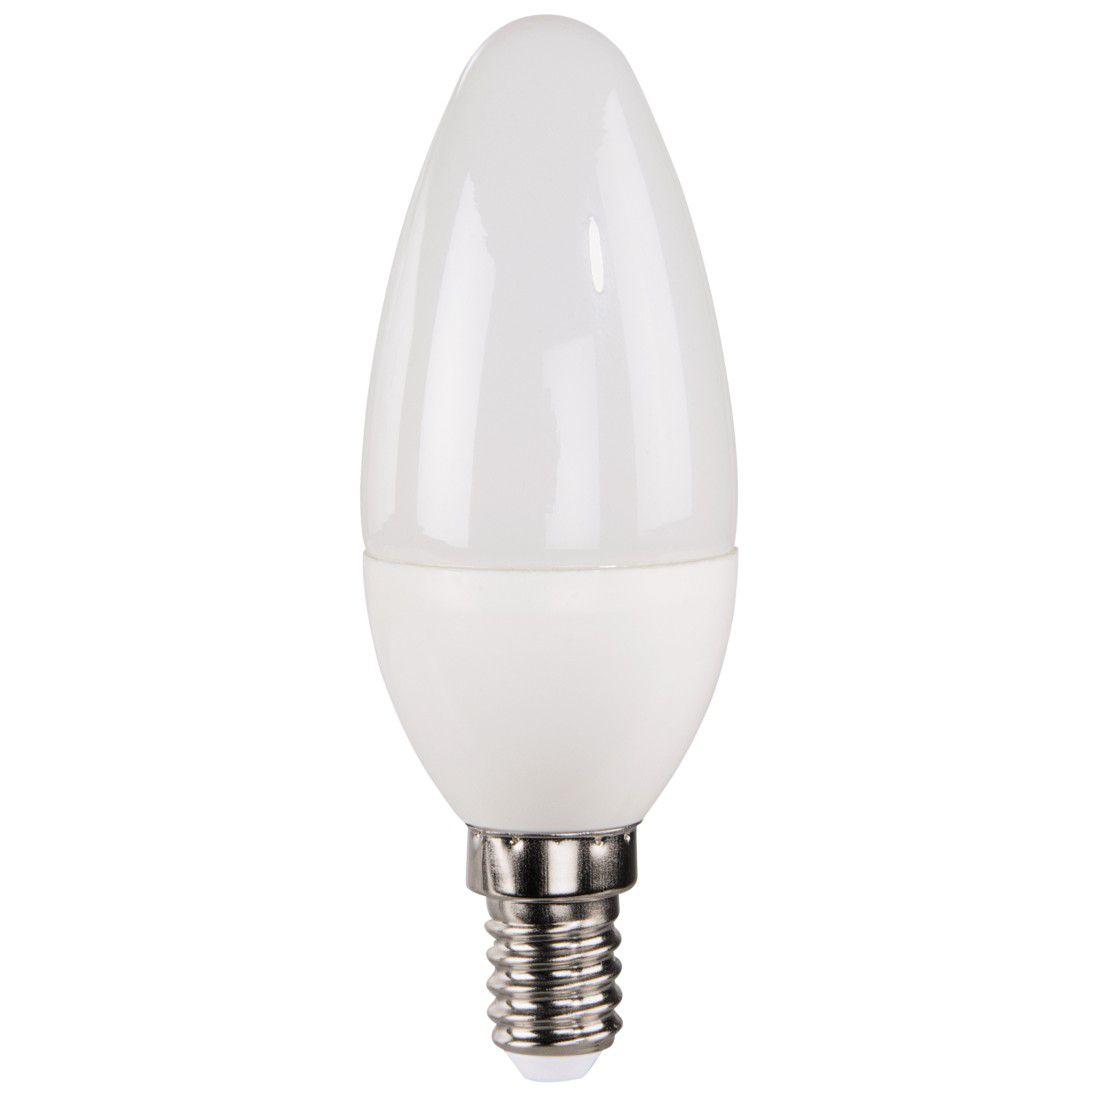 Xavax LED Lampe, E14, 250lm Ersetzt 25W Kerzenlampe, Warmweiß